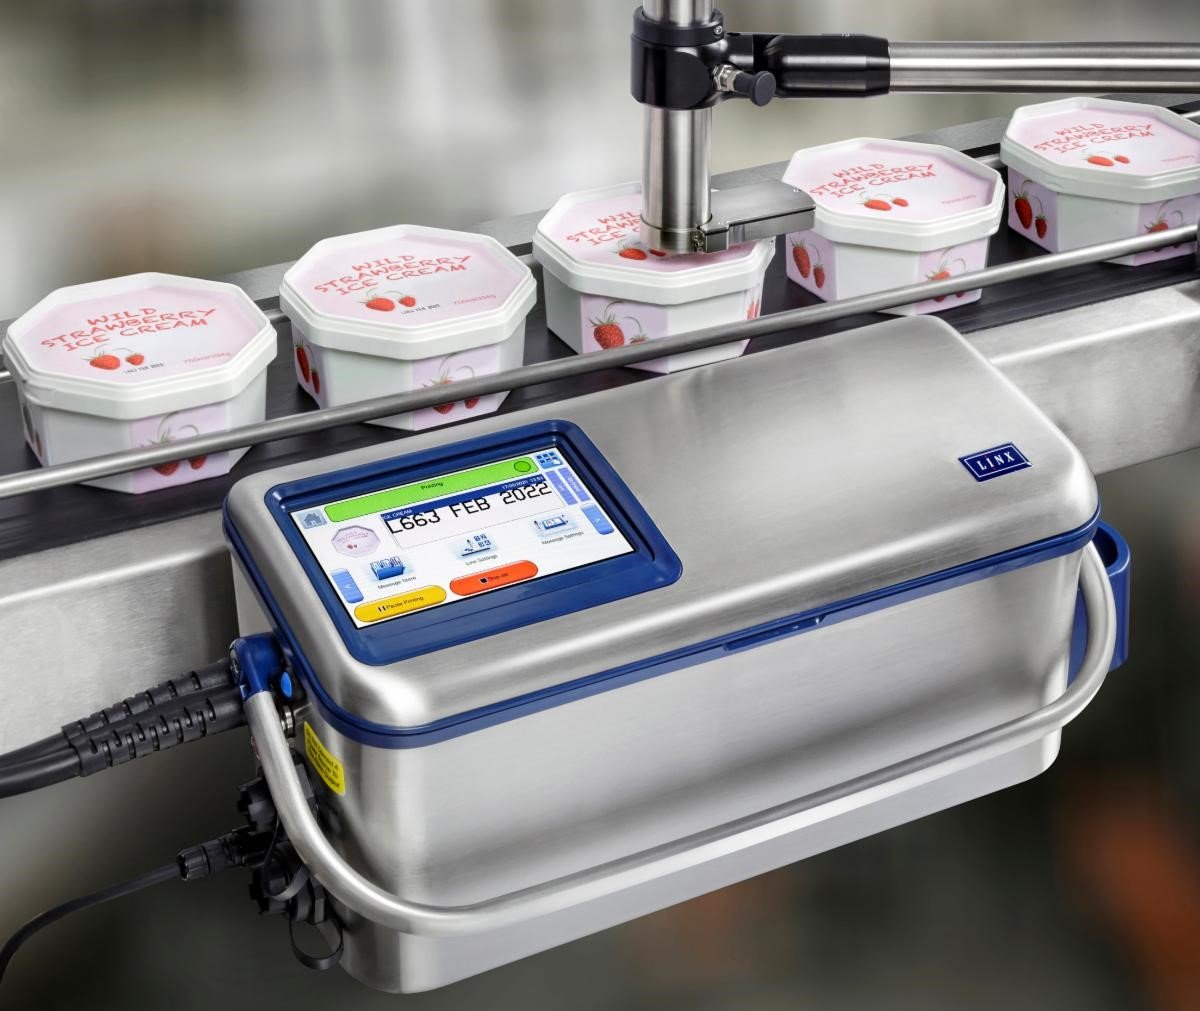 linx-10-cij-printer-for-sale.jpg